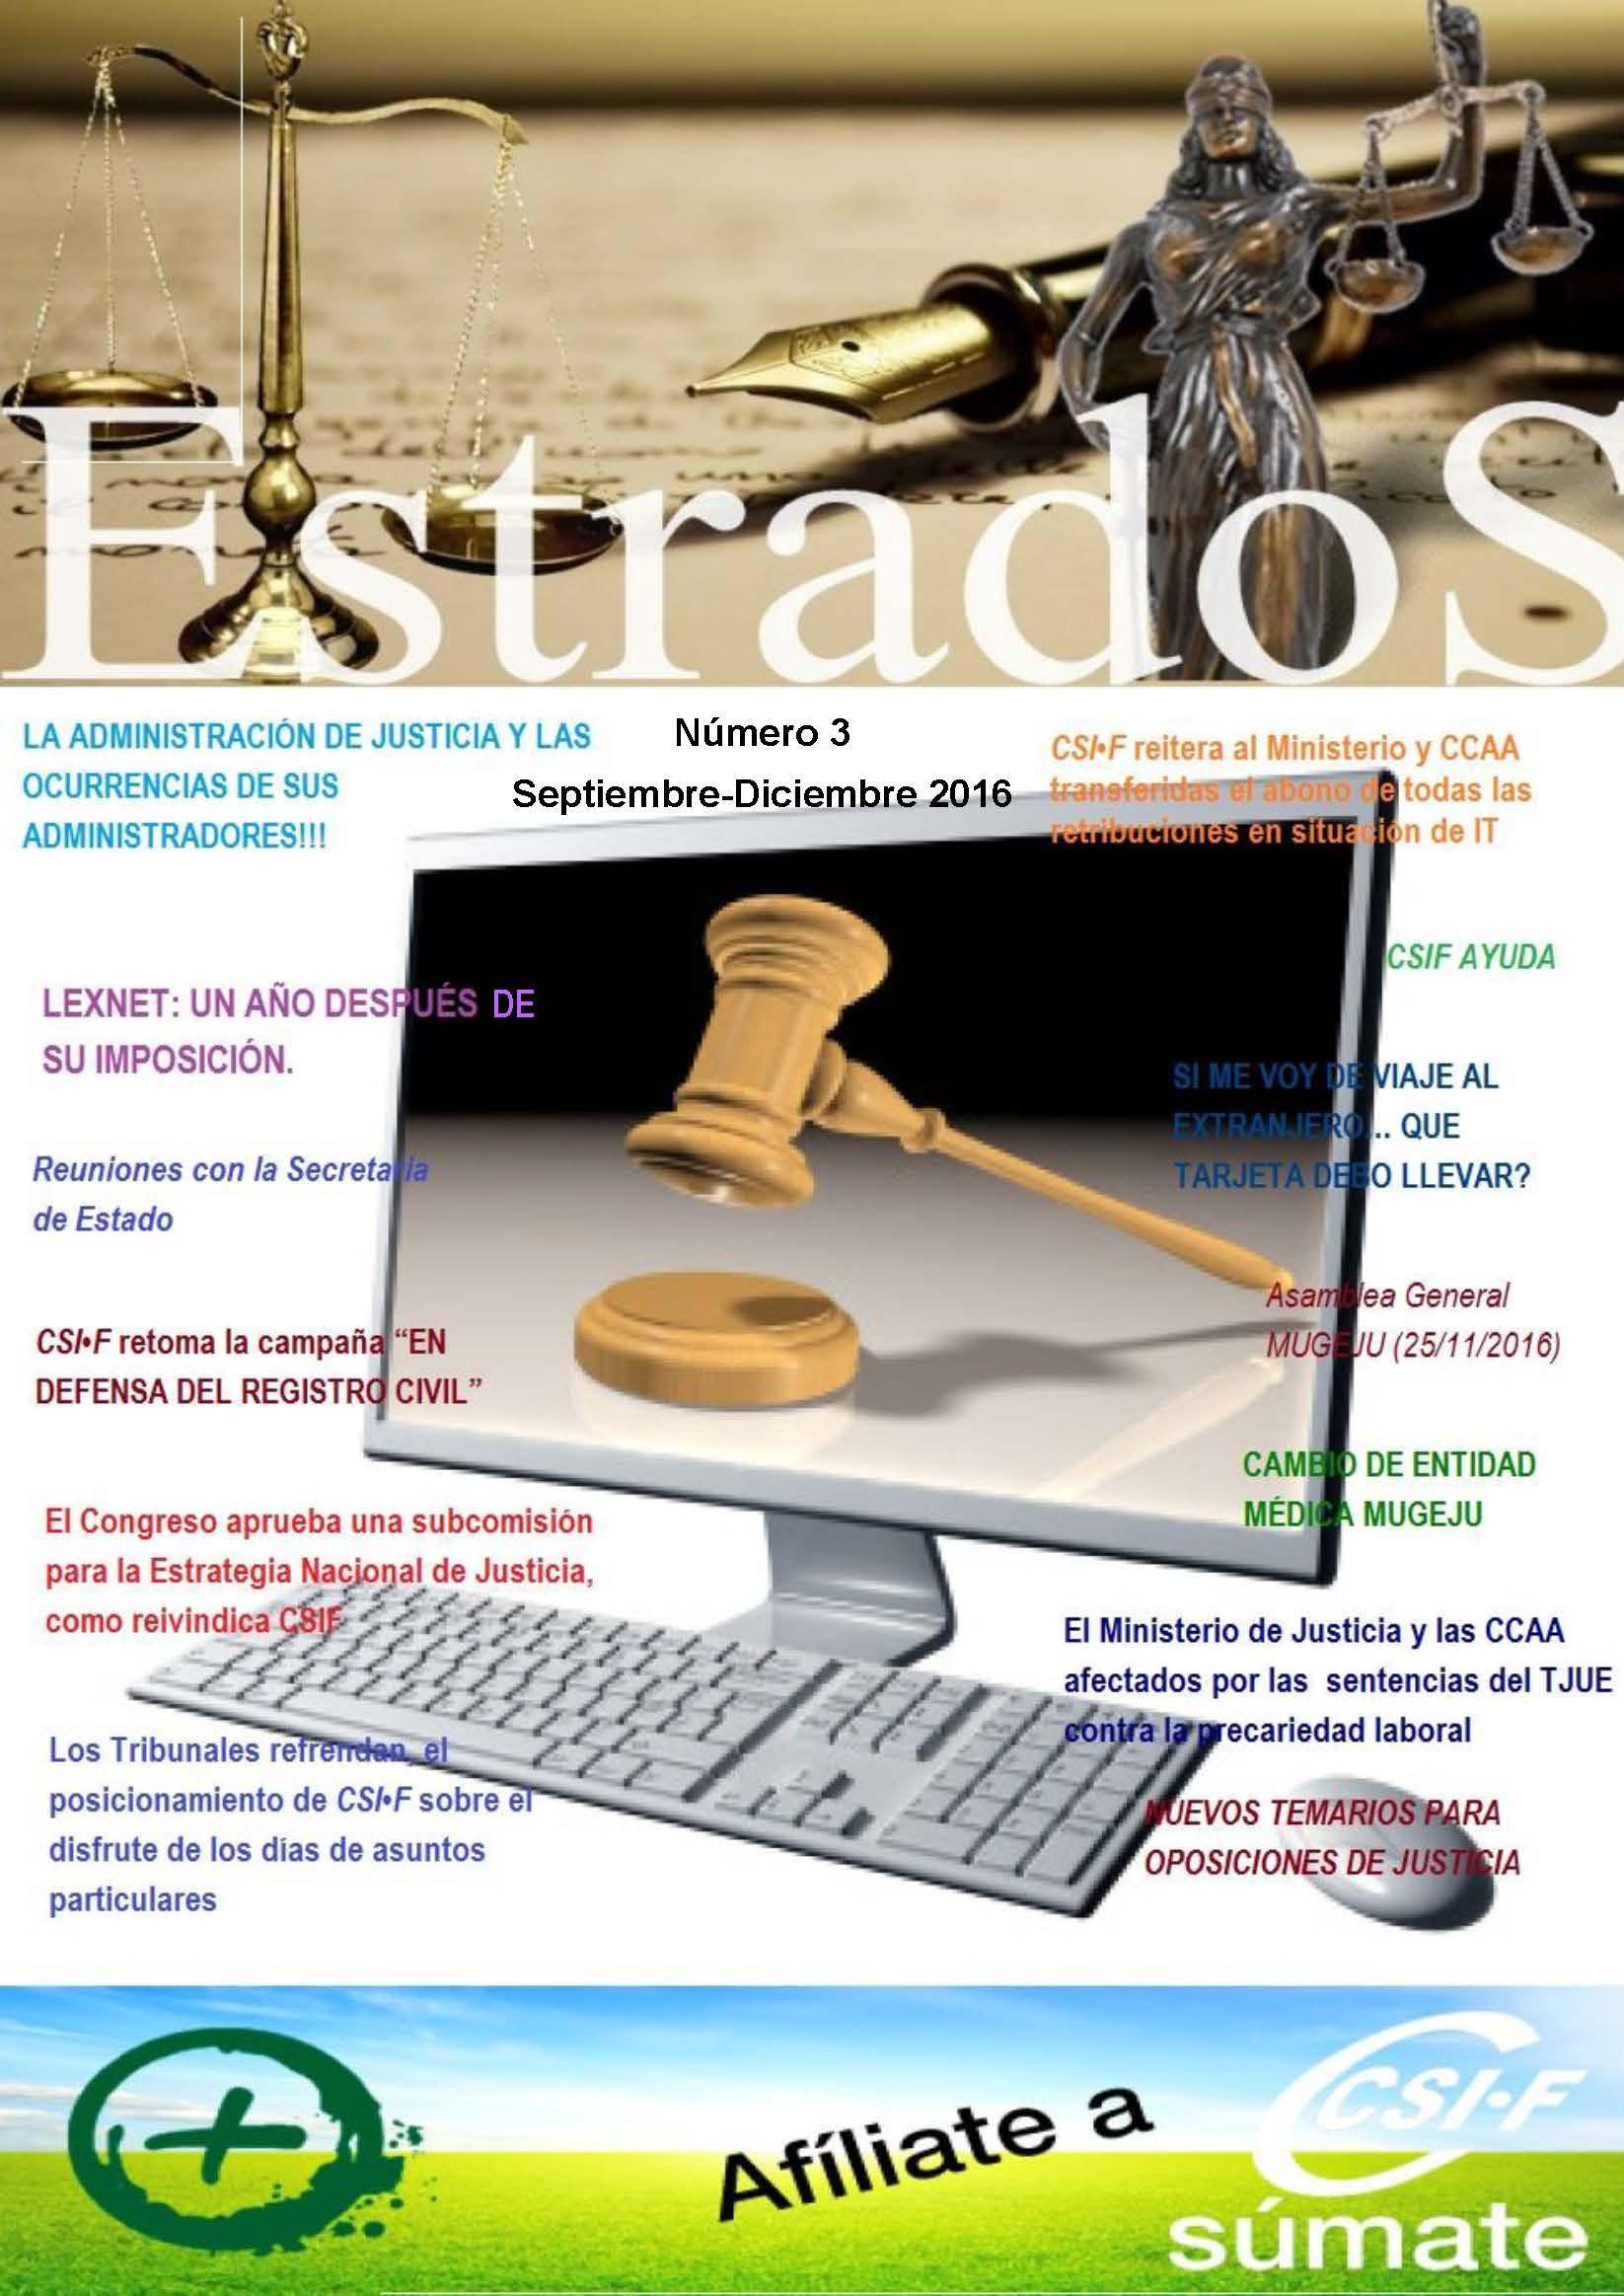 REVISTA ESTRADOS